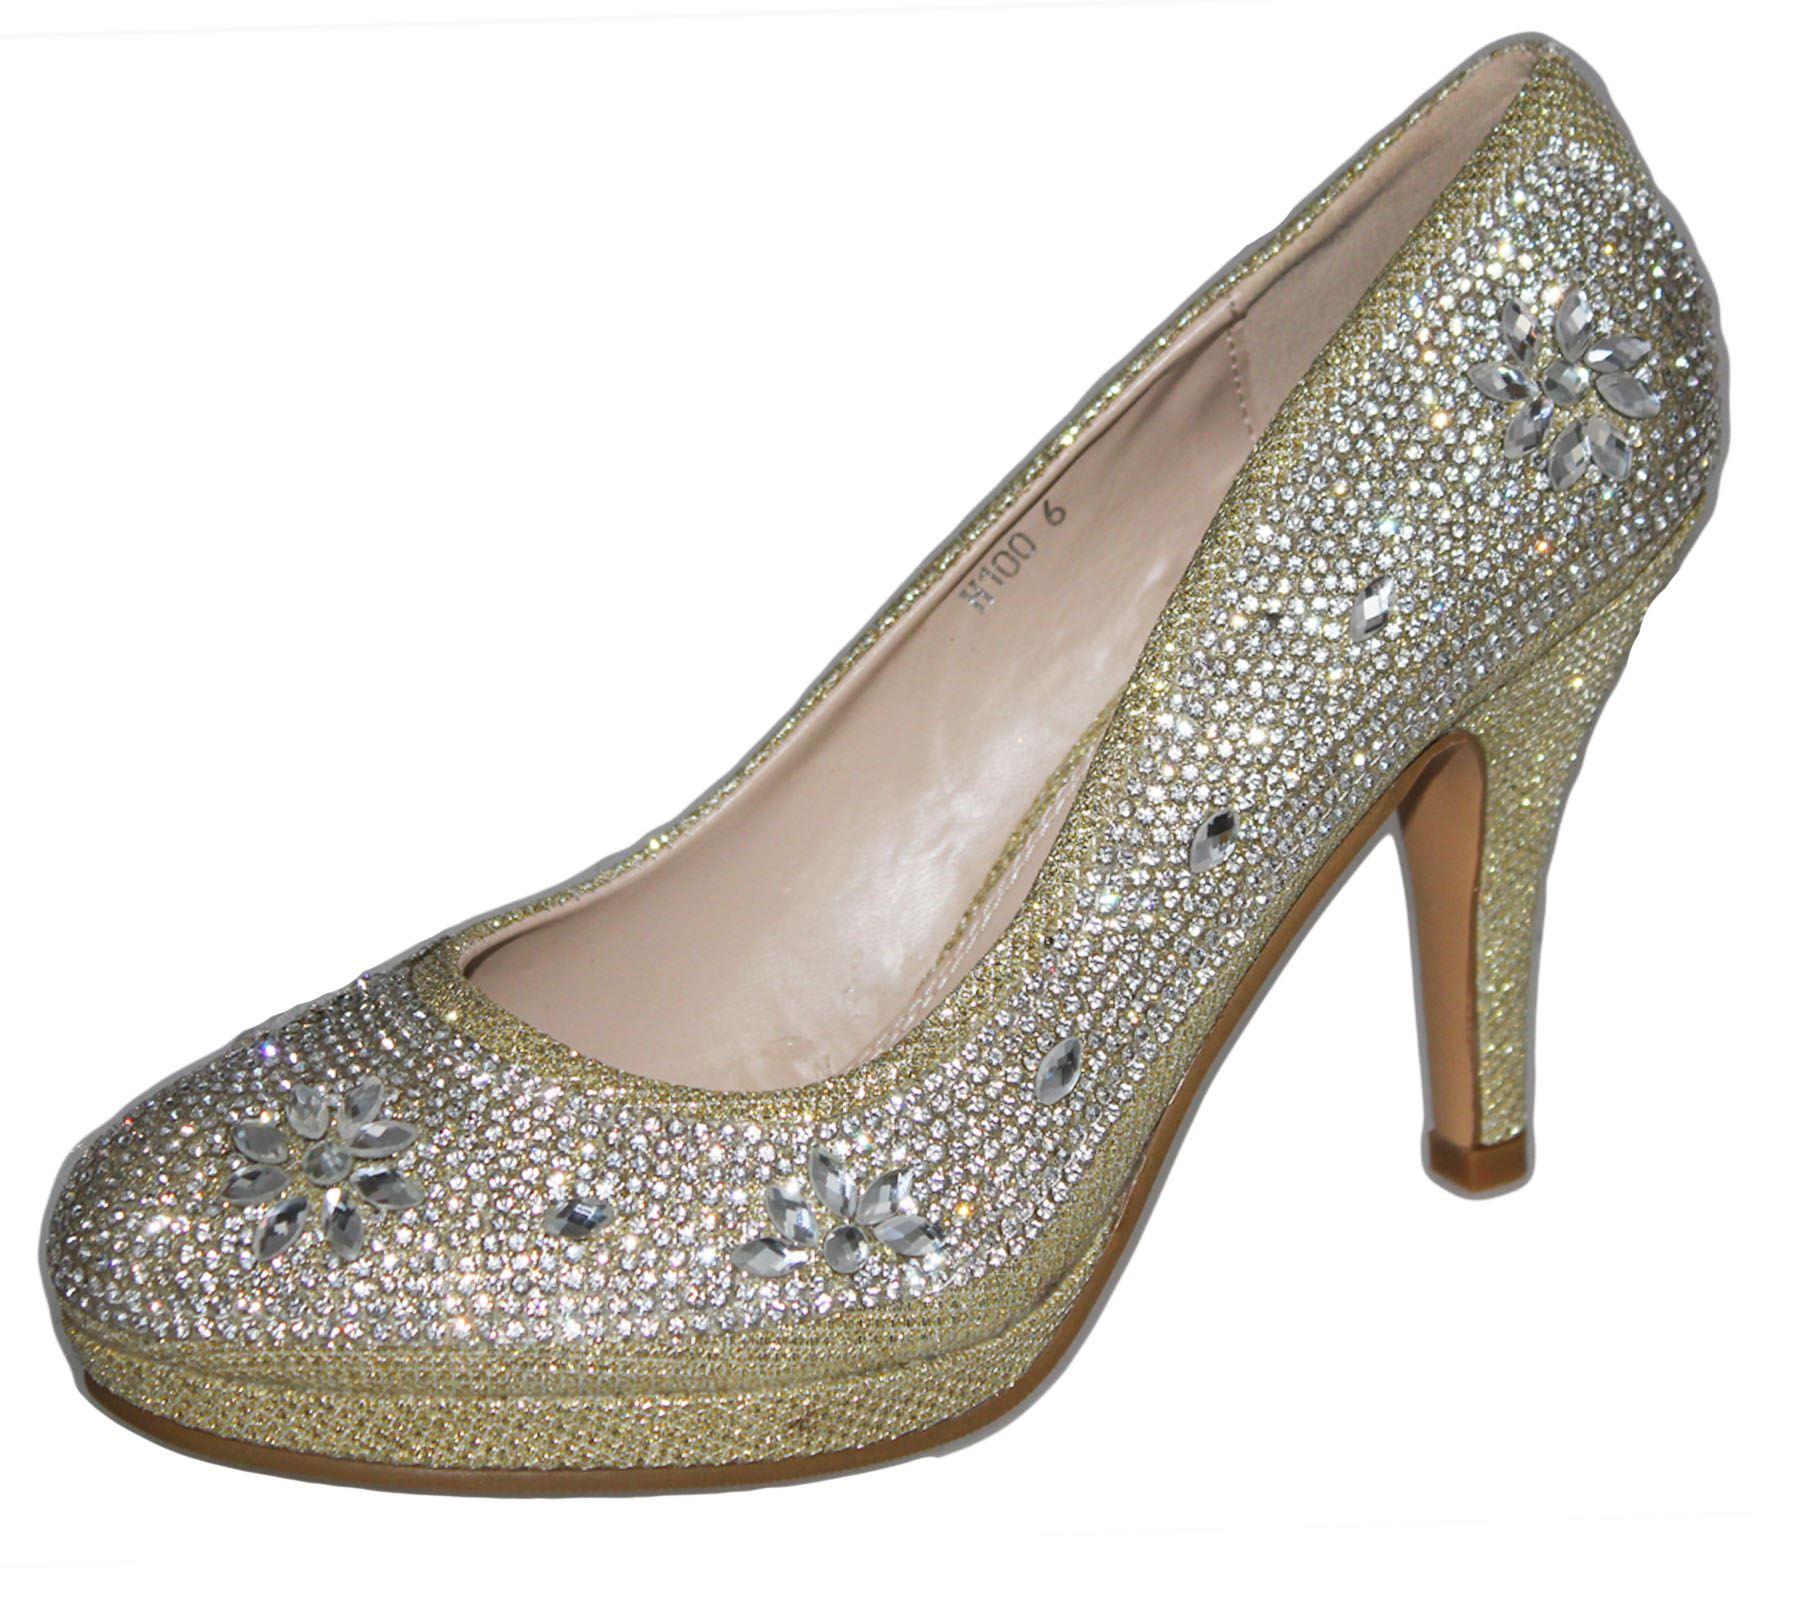 Womens-Platforms-High-Heels-Wedding-Bridal-Evening-Diamante-Ladies-Party-Shoes miniatura 24